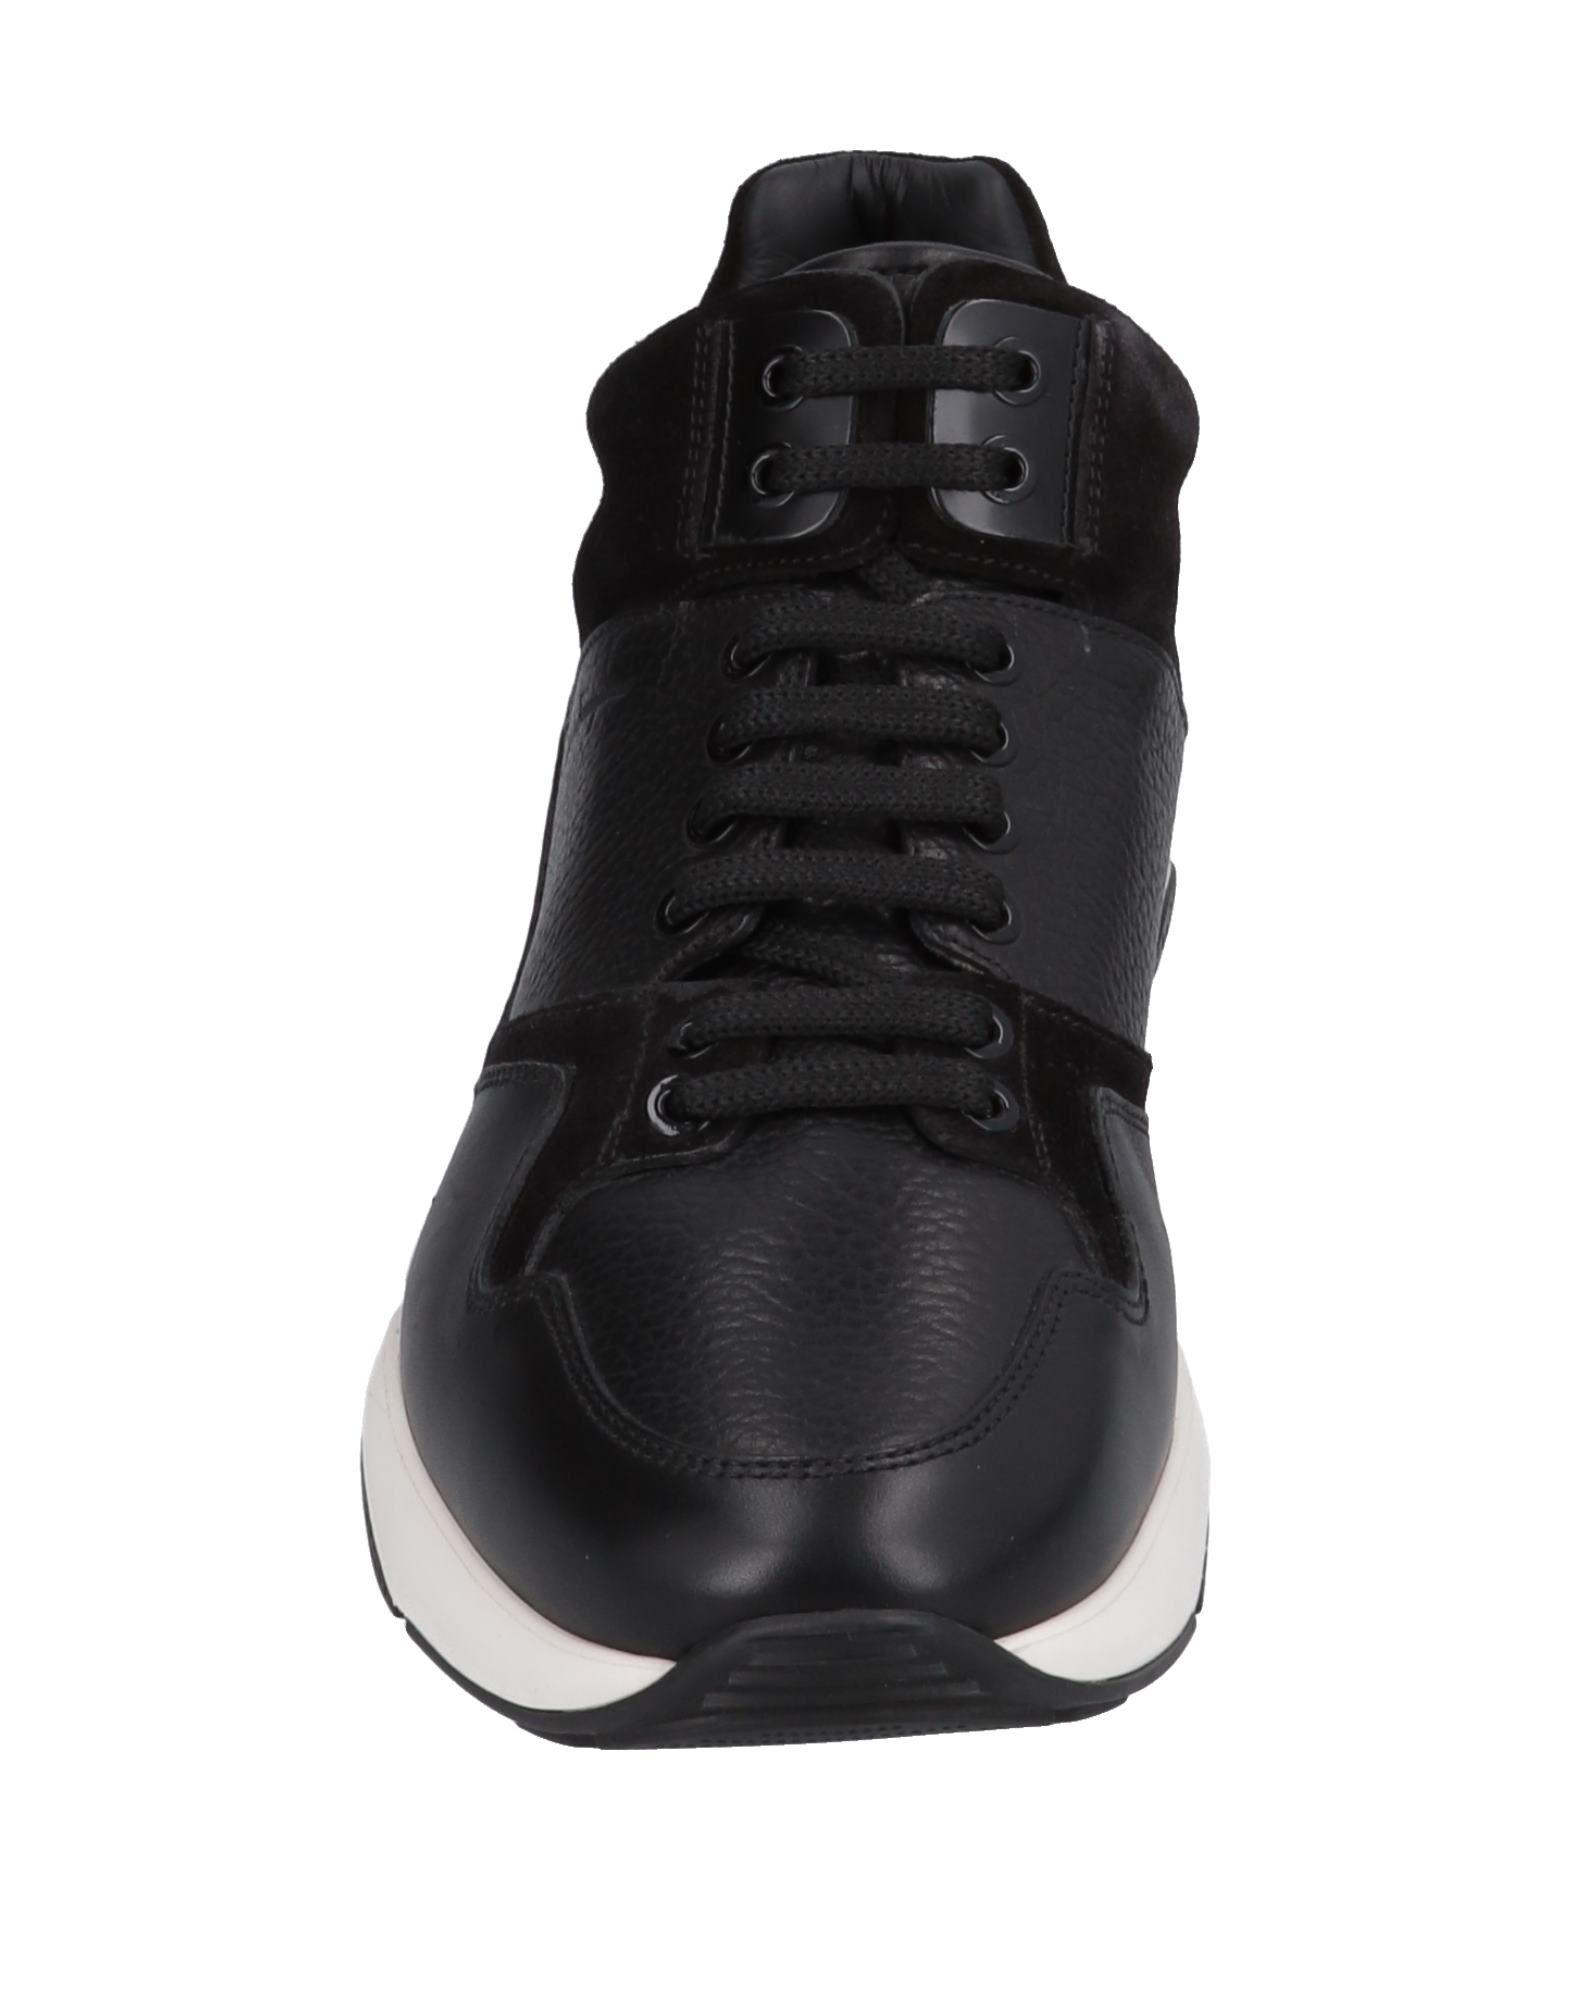 Salvatore Ferragamo Sneakers Herren  Schuhe 11555240DQ Gute Qualität beliebte Schuhe  e7f5e4